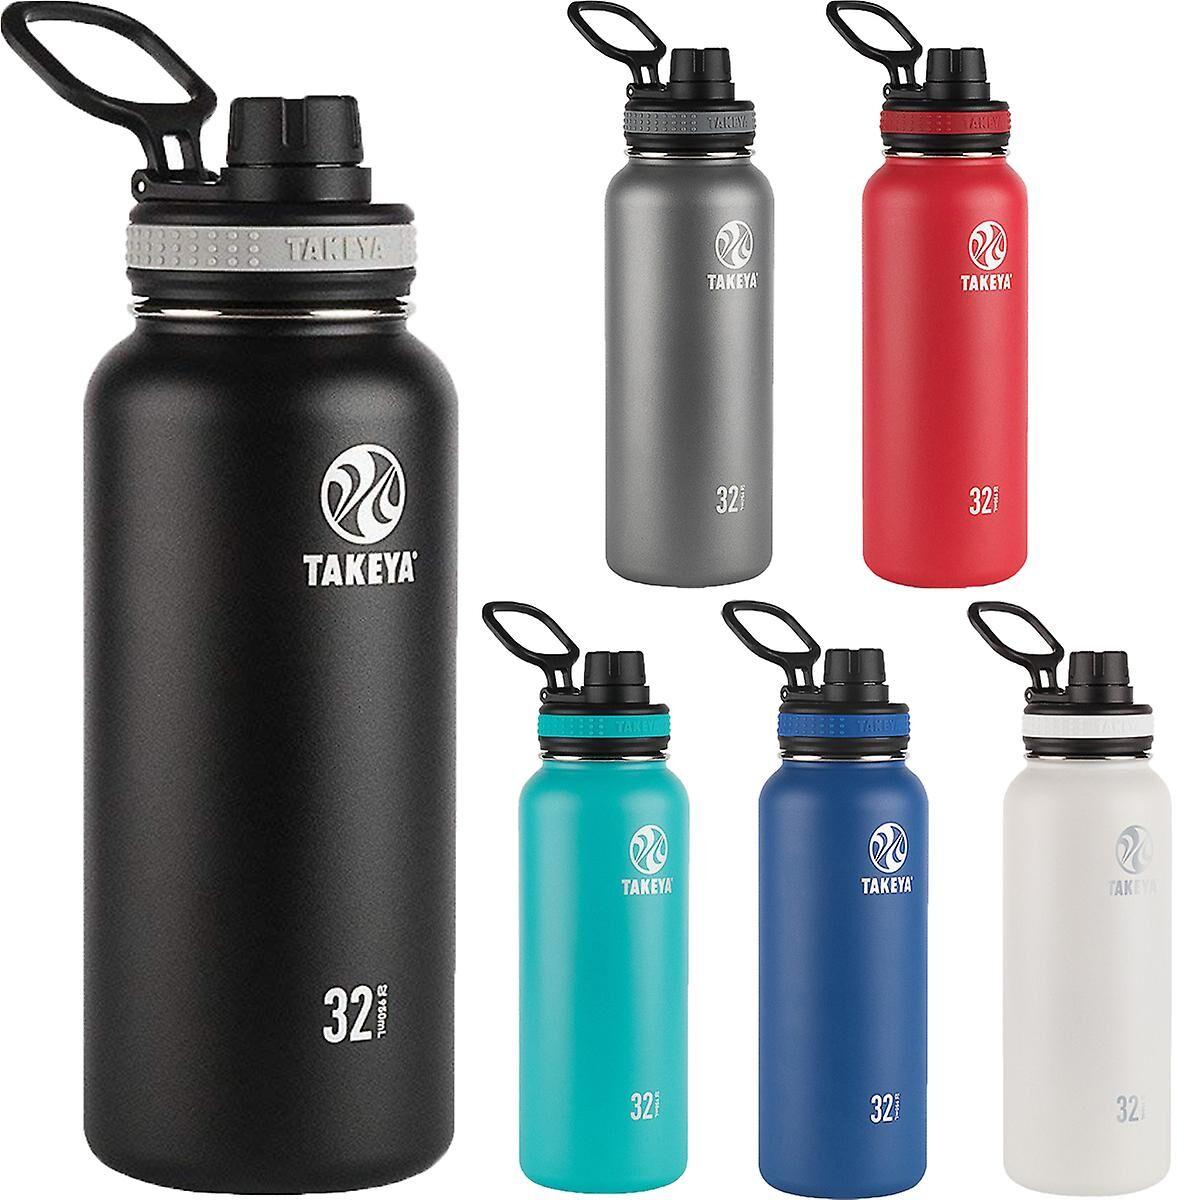 Takeya Bouteille d'eau isotherme inox 32 onces de Takeya originaux